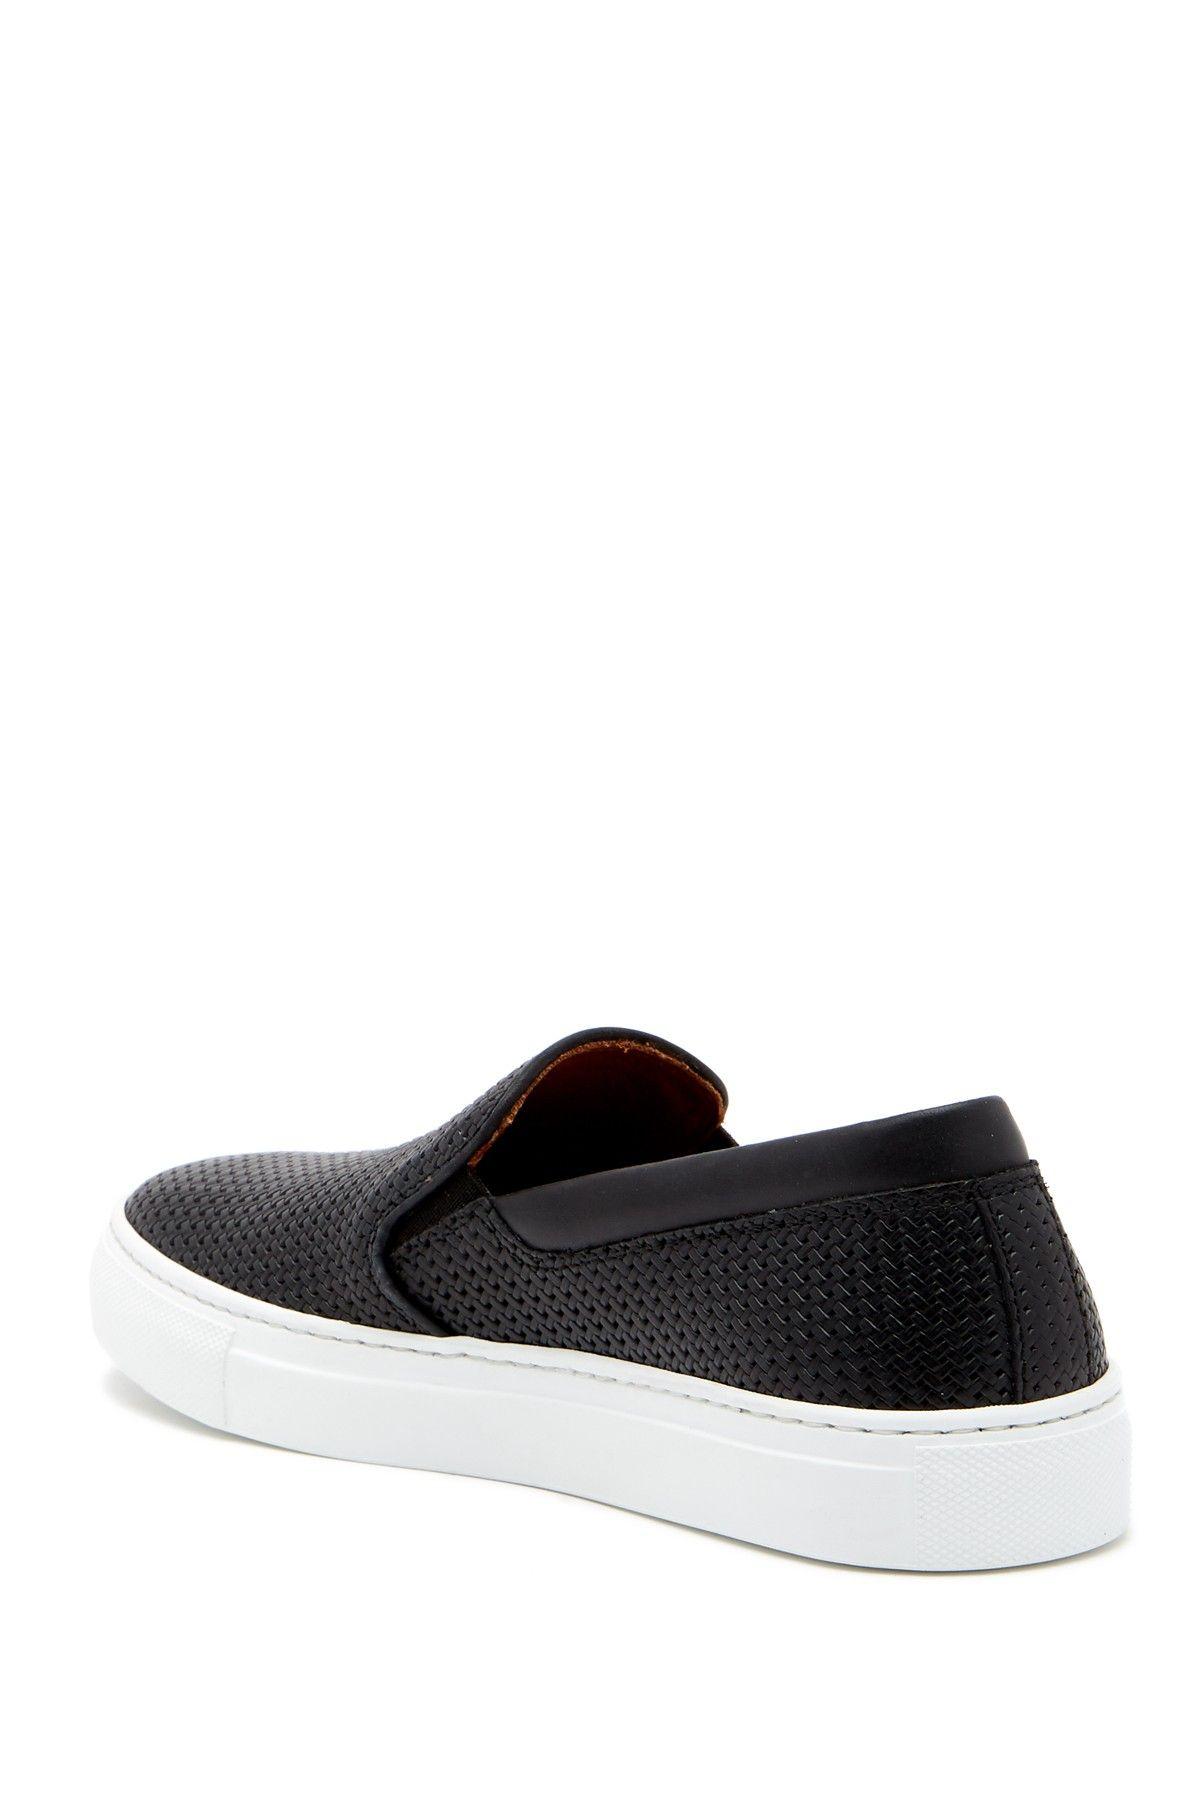 11d056d1bfa Aquatalia - Alisha Slip-On Sneaker is now 56% off. Free Shipping on